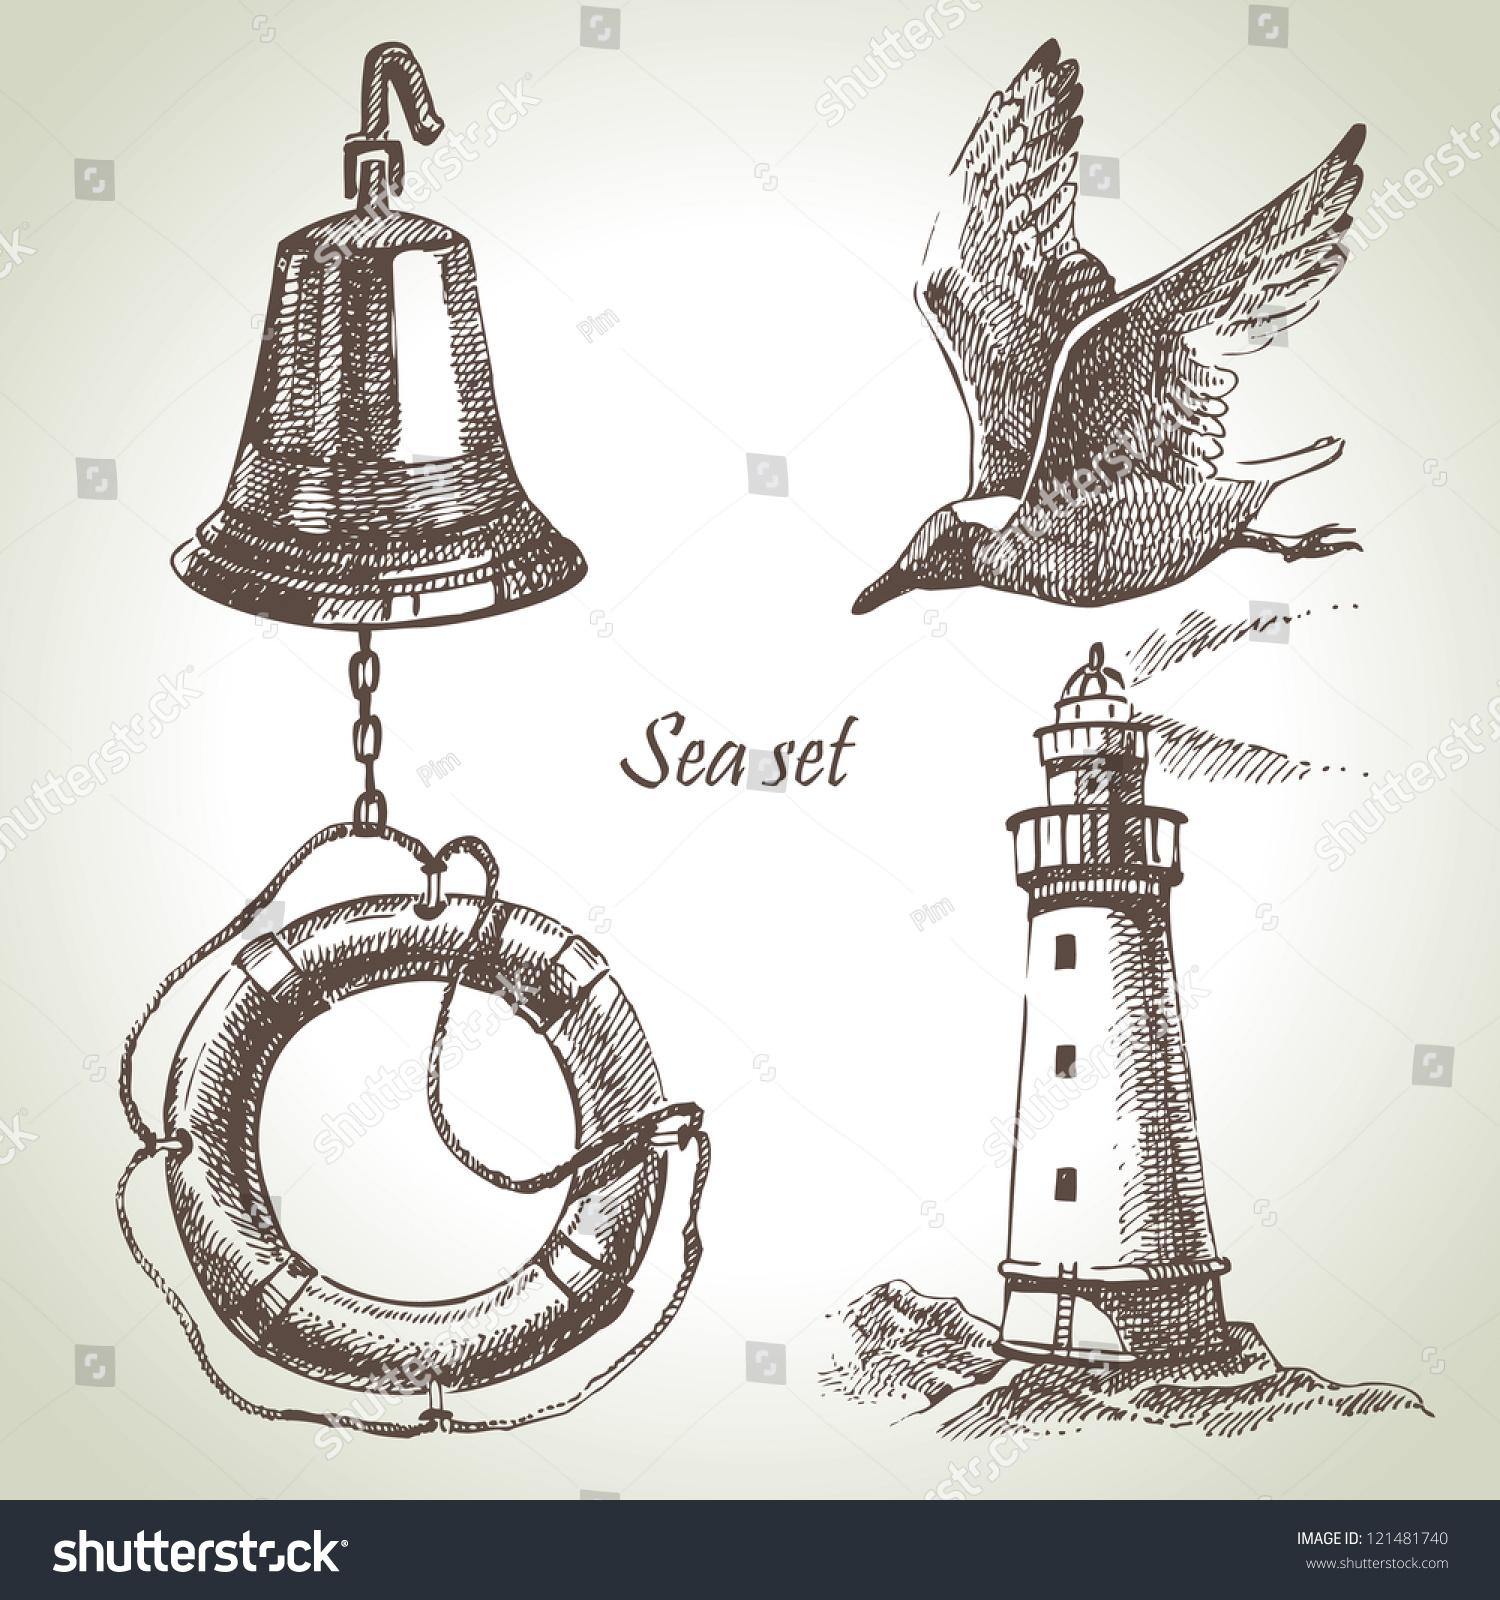 Key Elements Of Nautical Style: Sea Set Of Nautical Design Elements. Hand Drawn